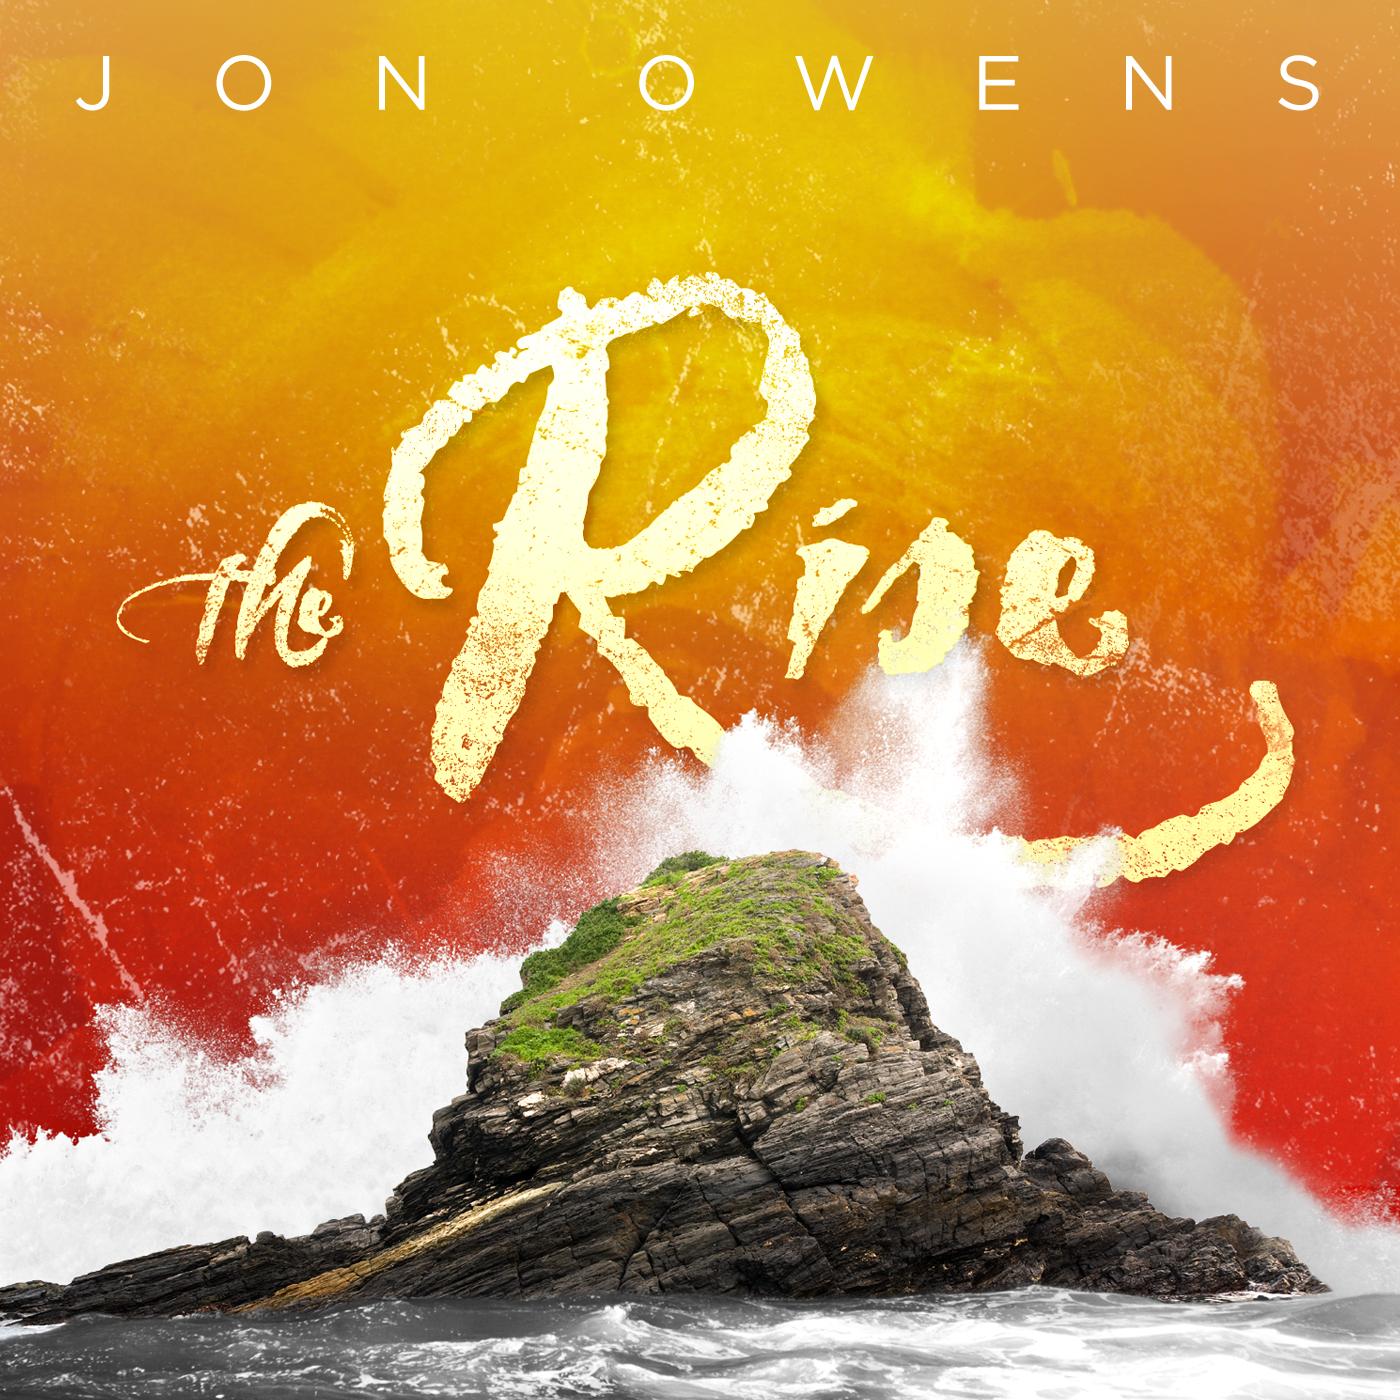 Jon Owens